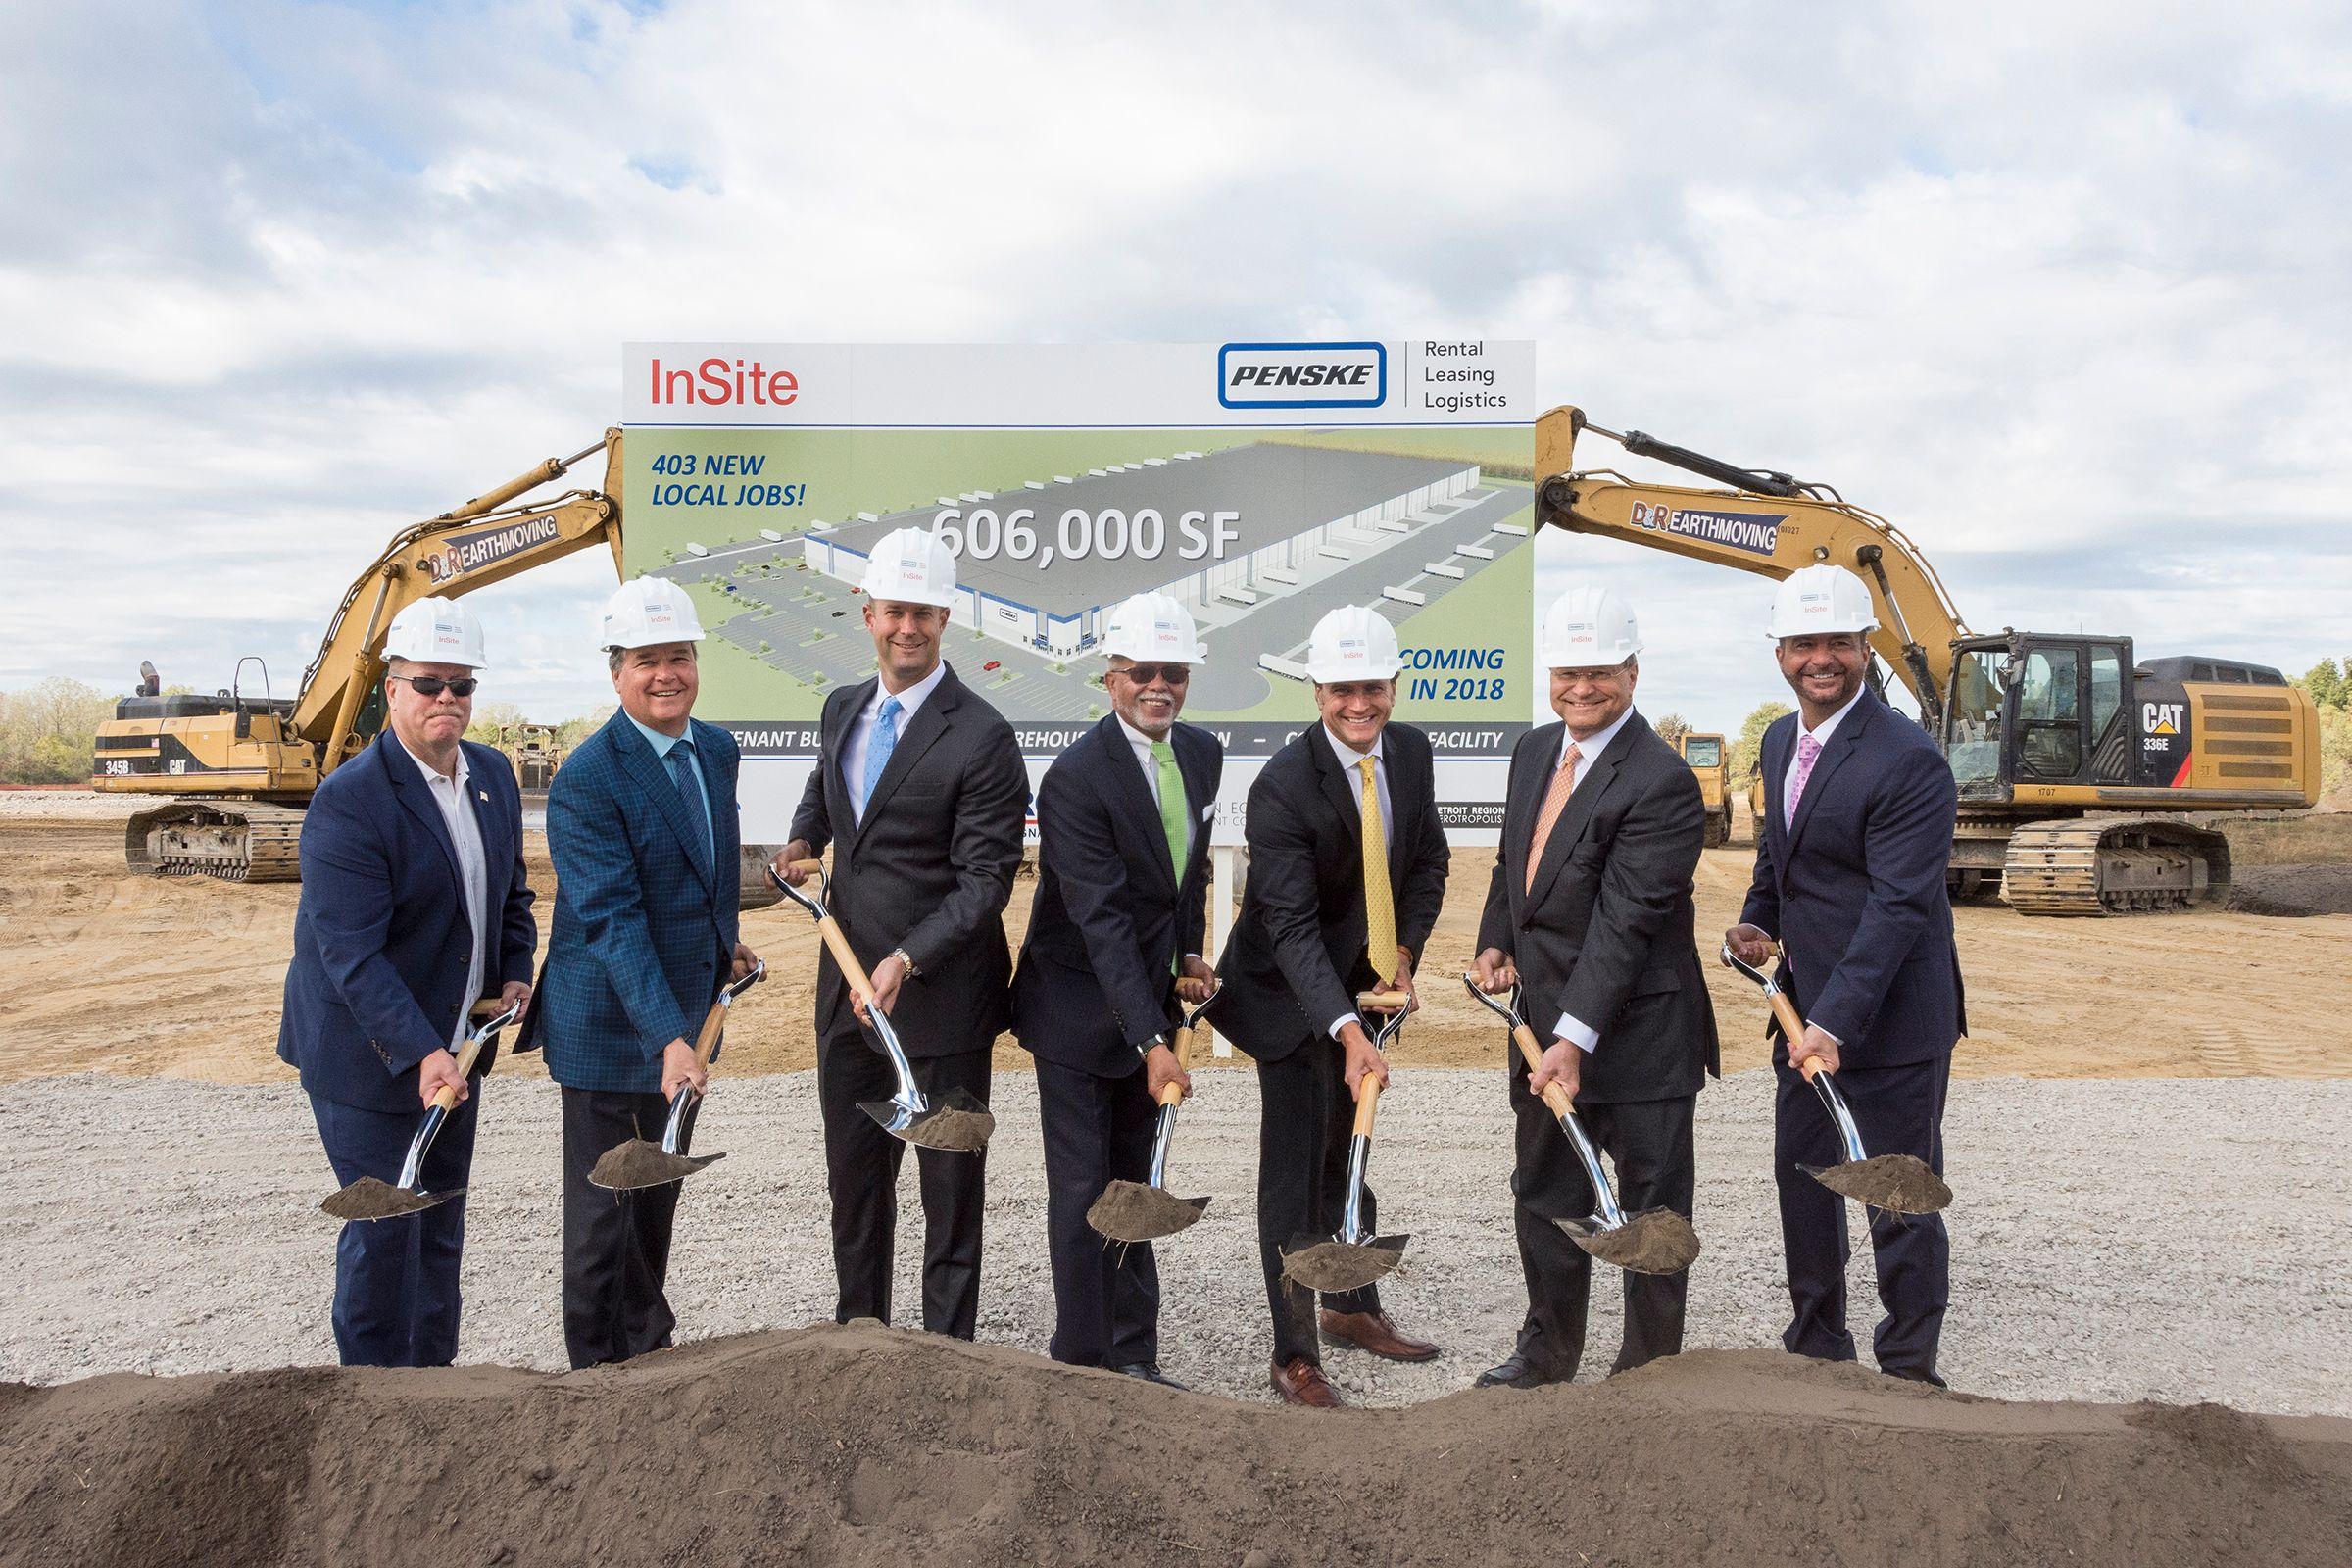 Penske Logistics Breaks Ground on New Distribution Center in Romulus, Michigan